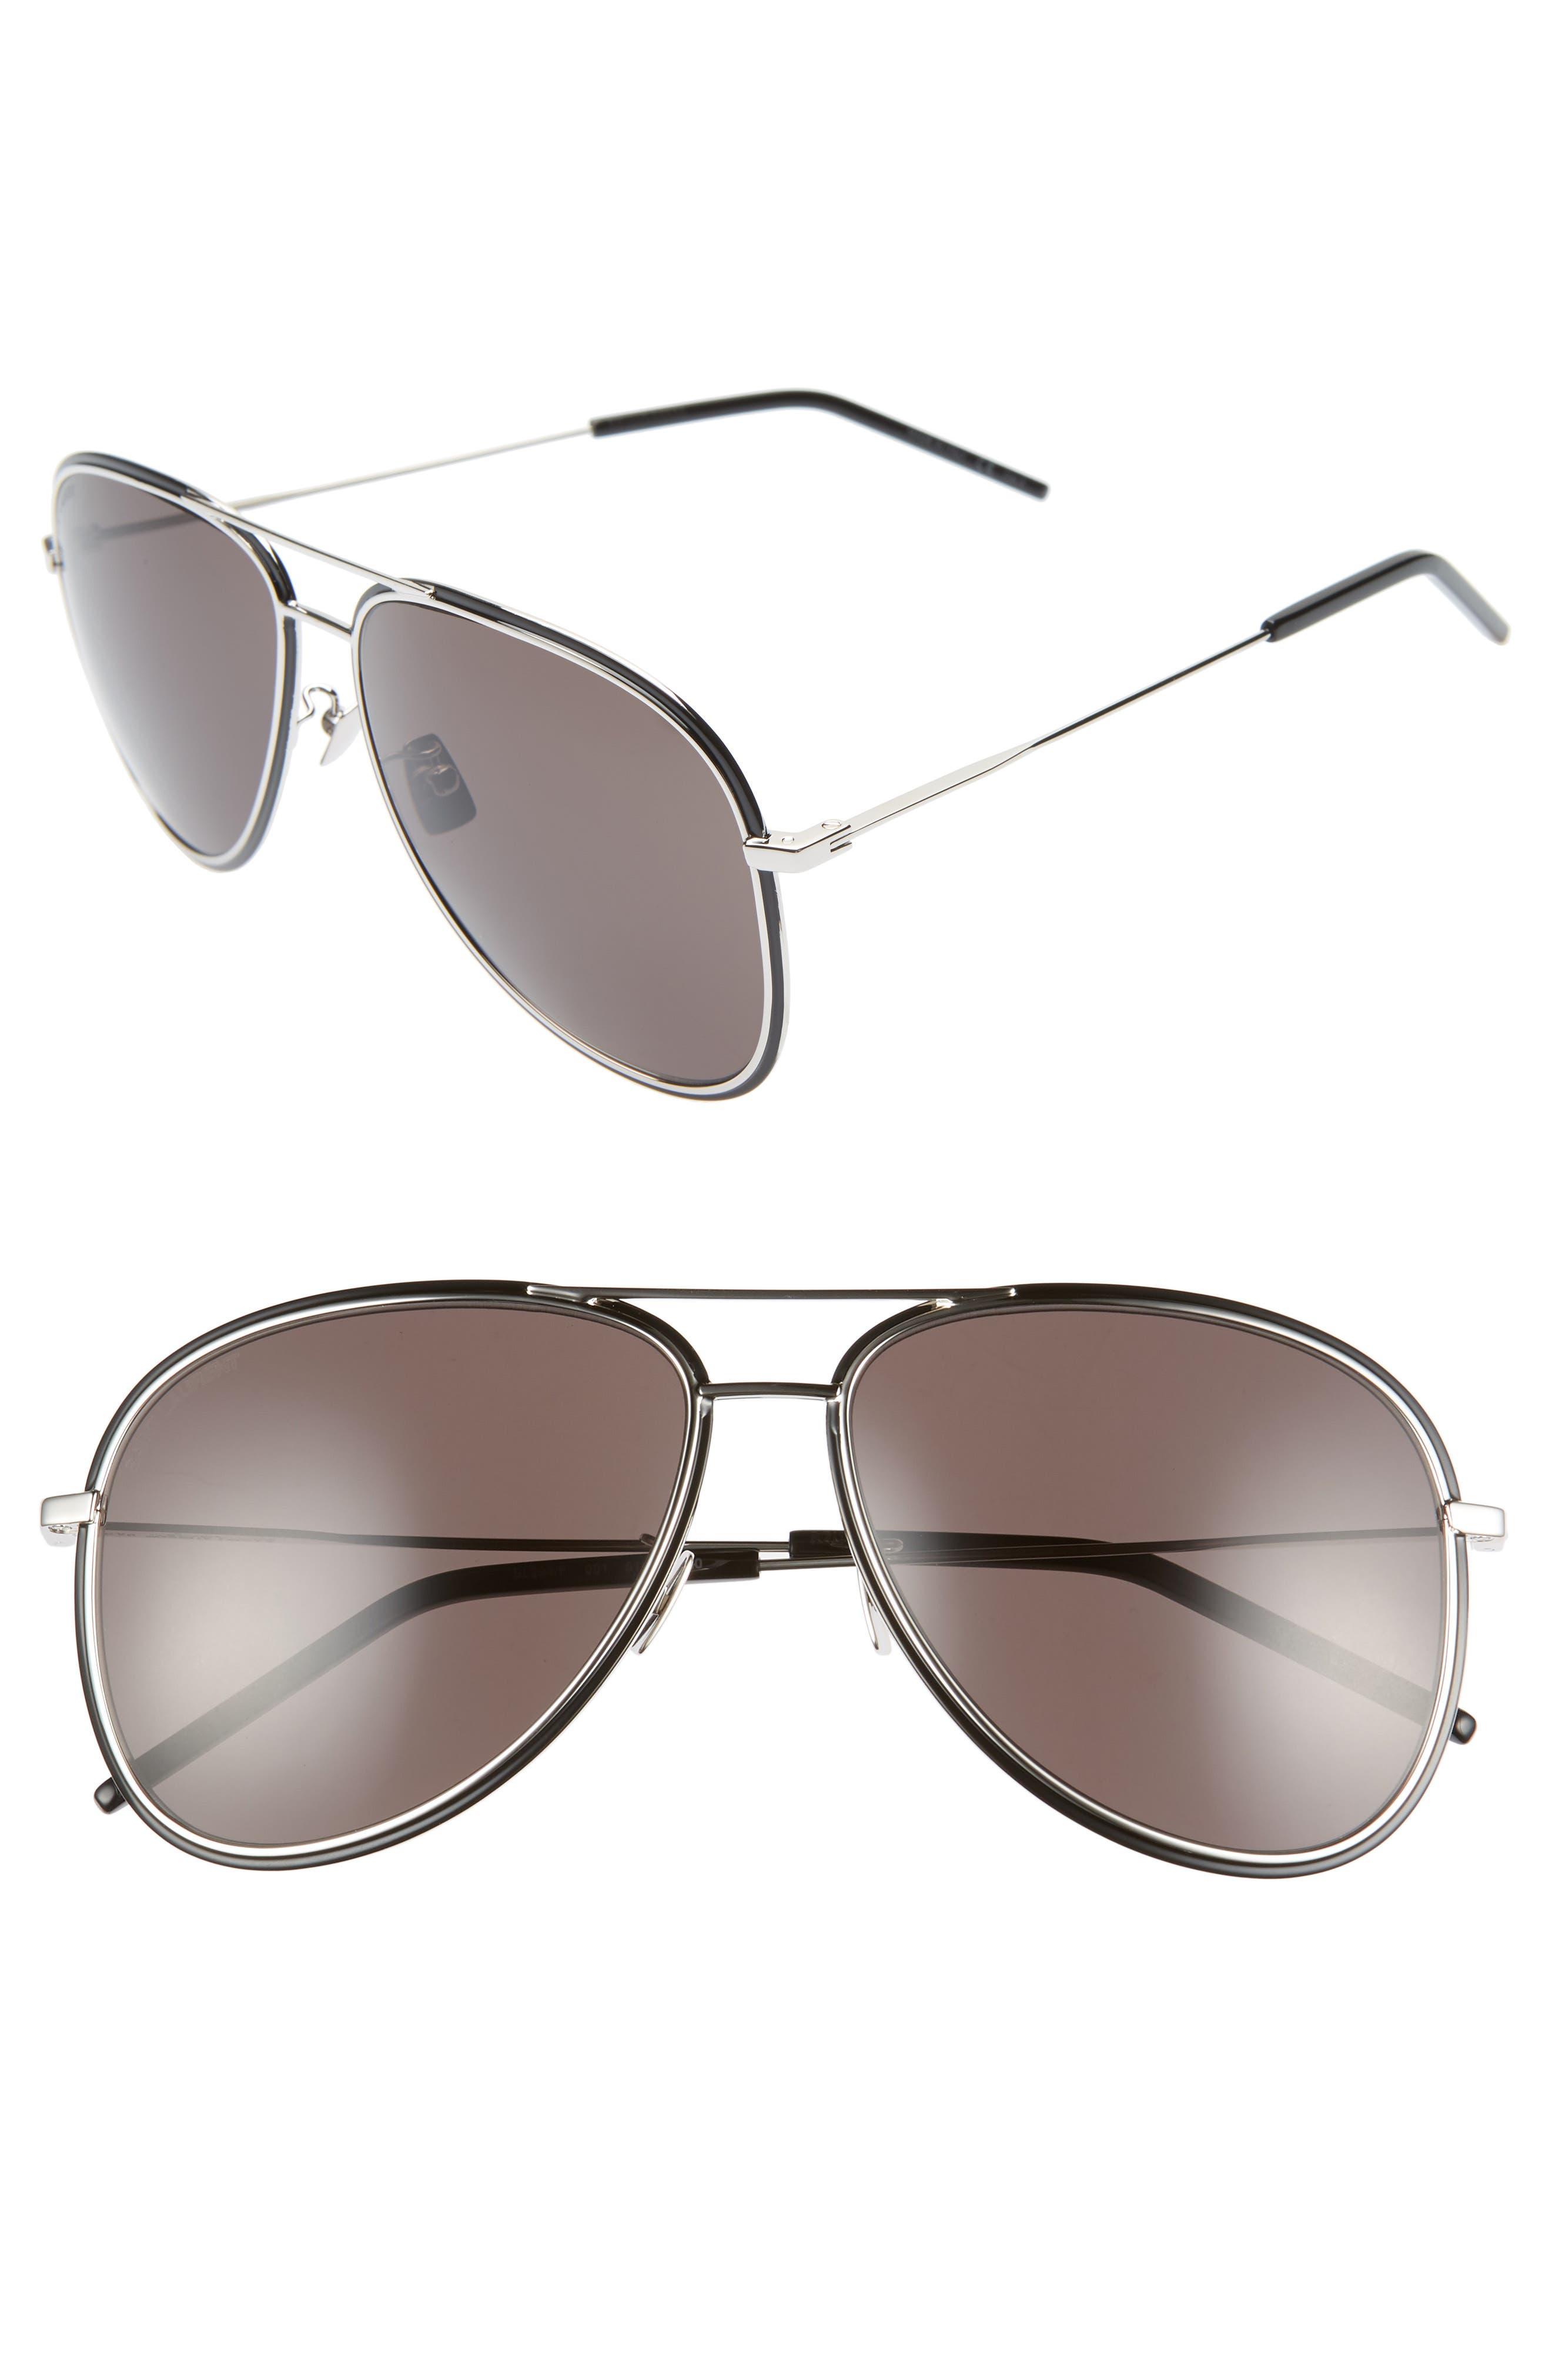 Saint Laurent 61Mm Aviator Sunglasses - Silver/ Black Enamel/ Grey